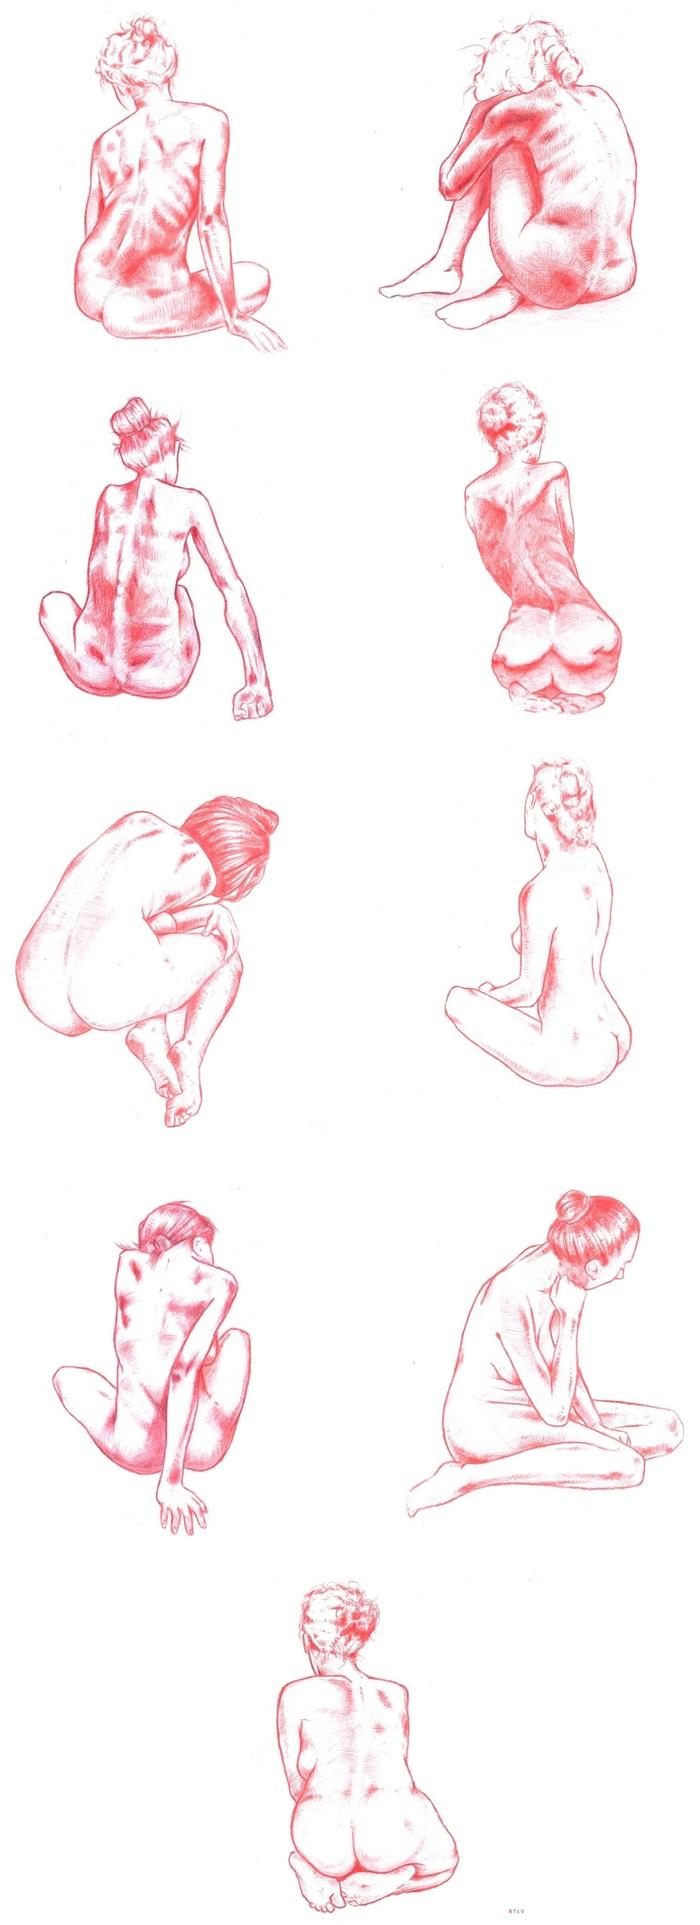 Red# Все рисунки Длиннопост, Рисунок, Рисунок карандашом, Красный карандаш, Фигура